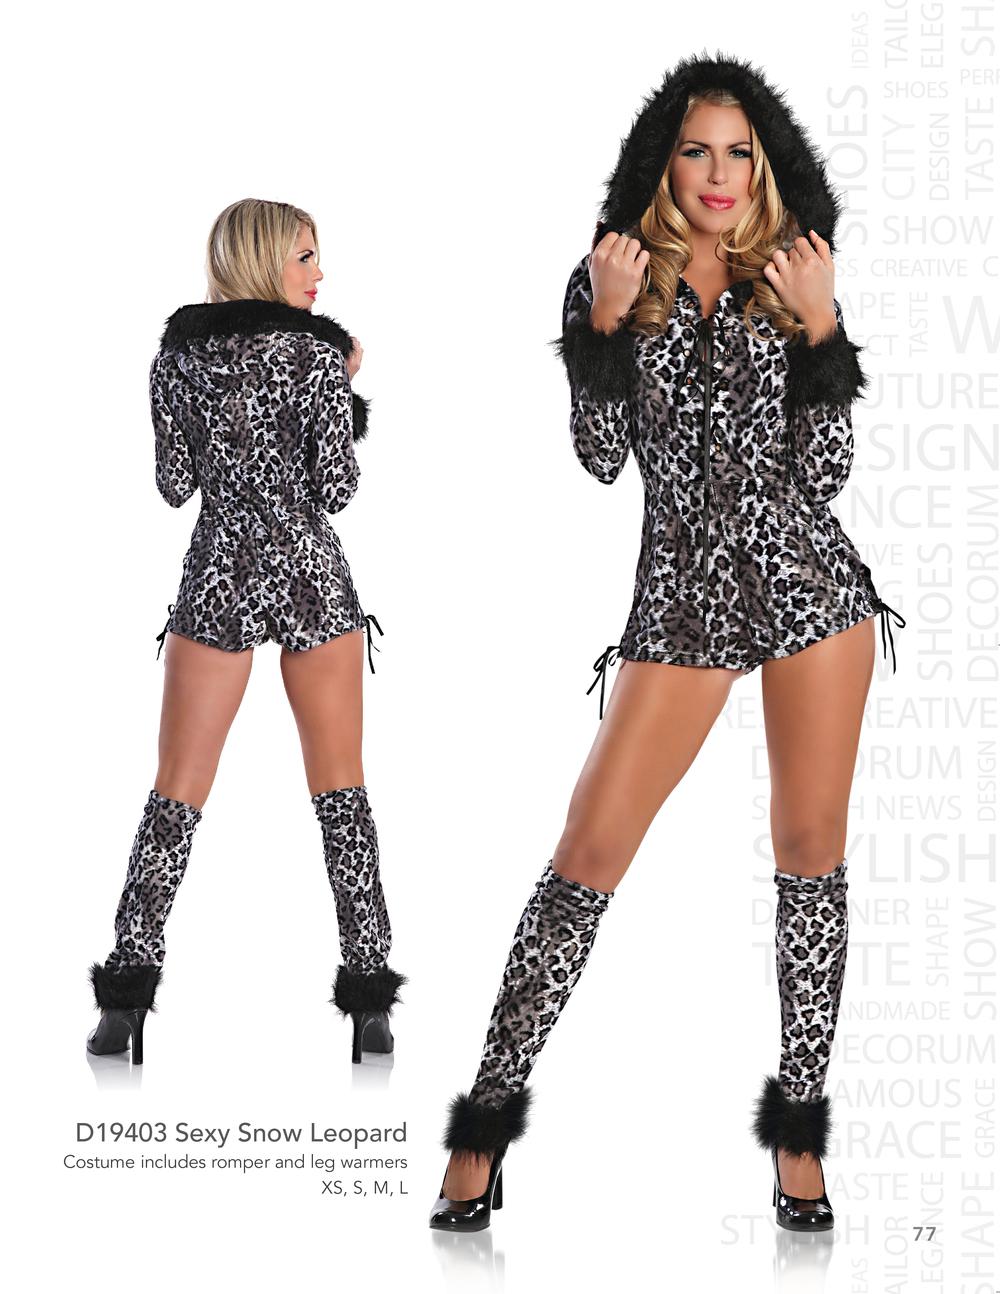 D19403 Sexy Snow Leopard